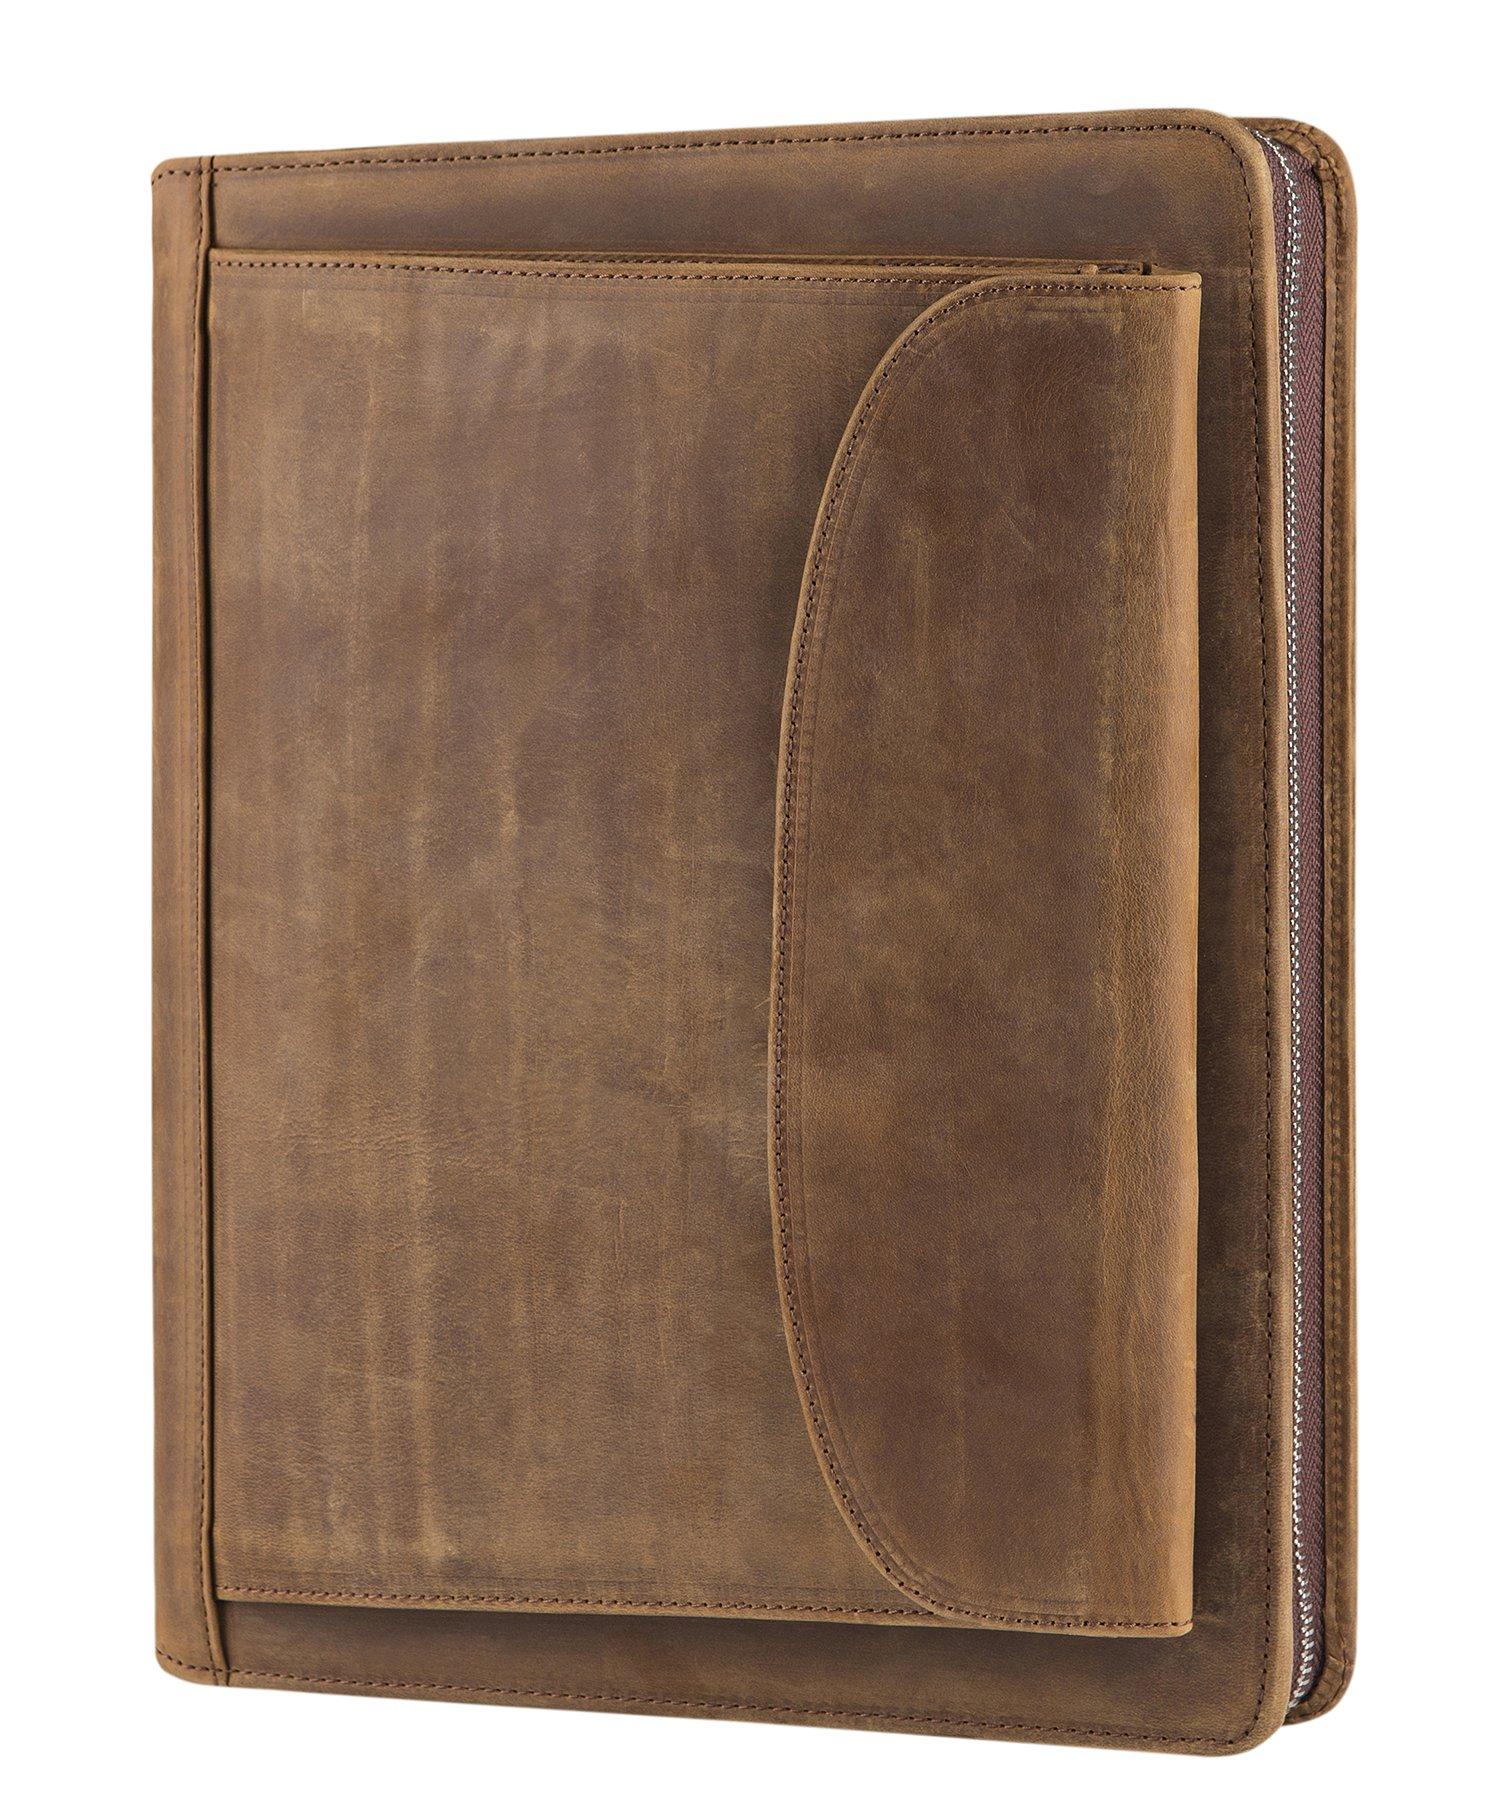 Vintage Crazy-Horse Portfolio Business Organizer Genuine Leather Padfolio Case with A4-Sized Notepad, Zipper Closure (Non-Custom, Brown)